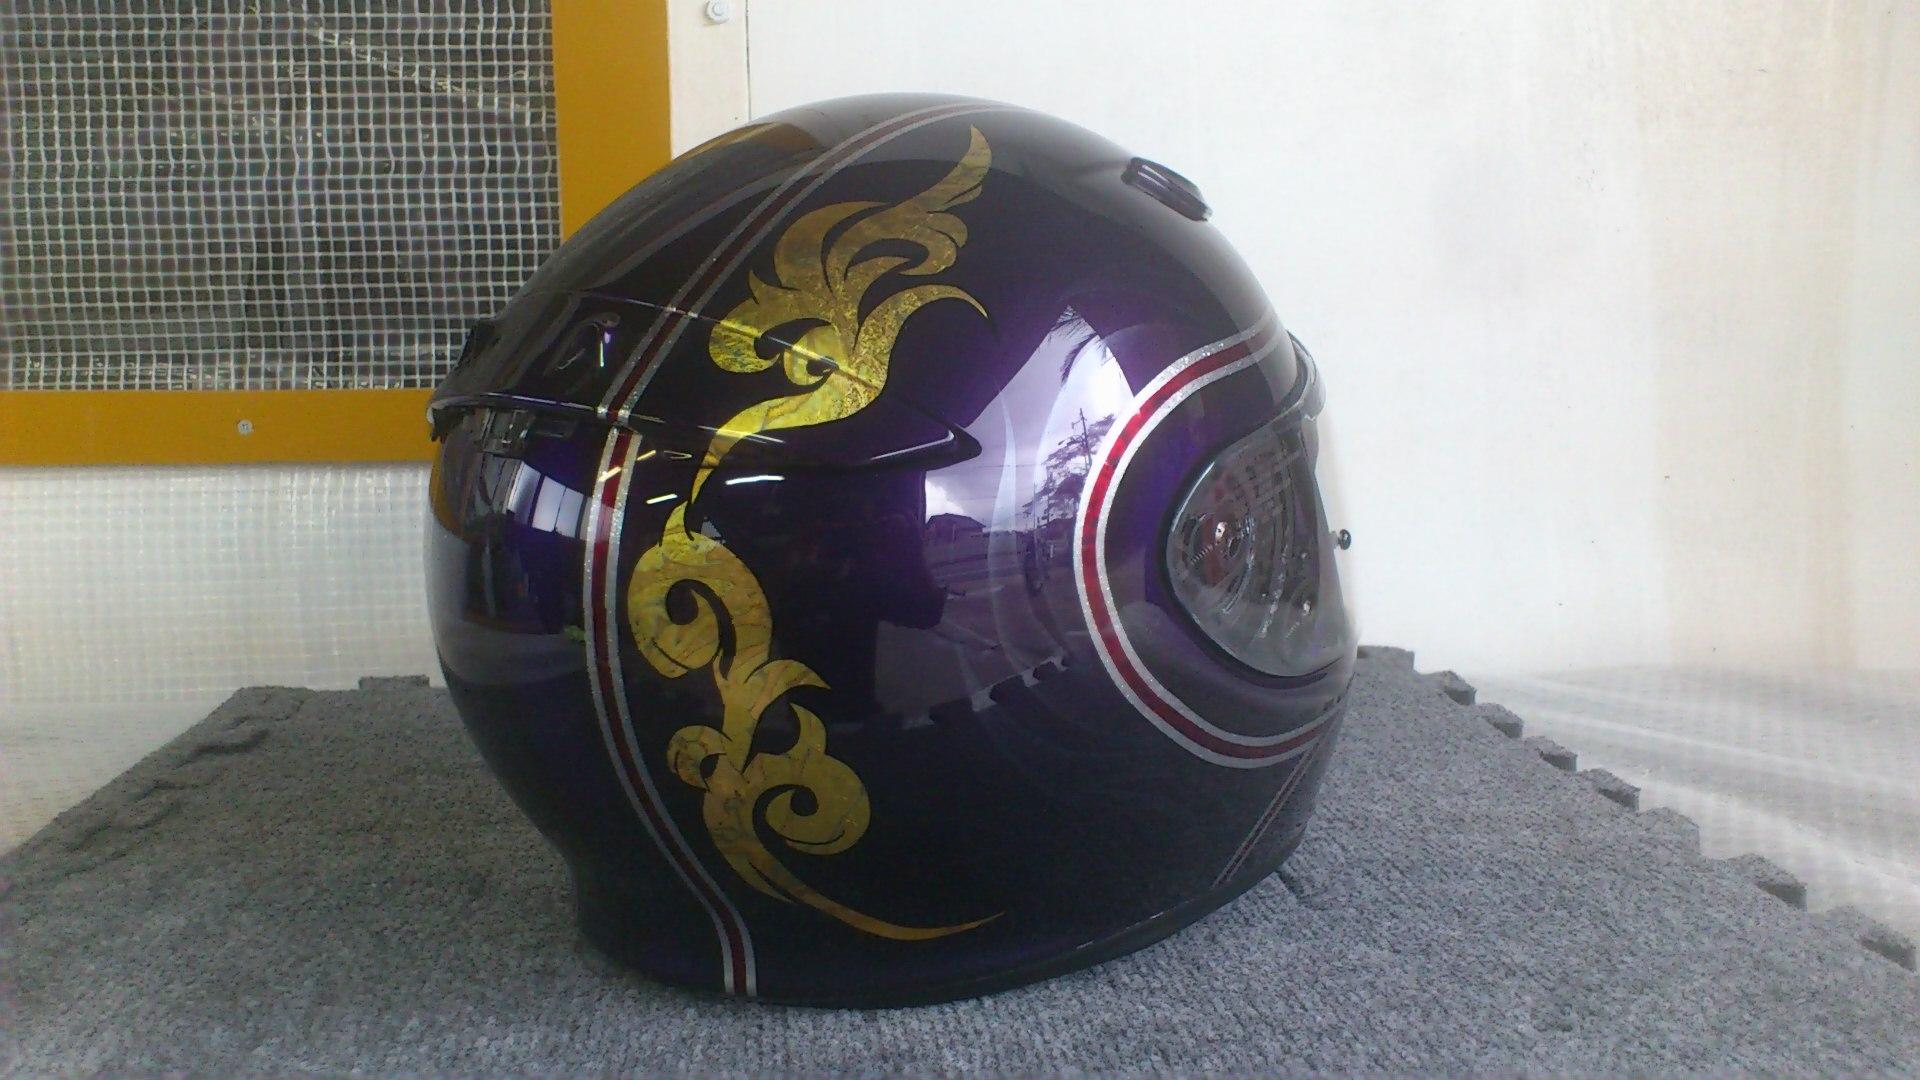 SHOEIフルフェイスヘルメット_e0269313_20243274.jpg